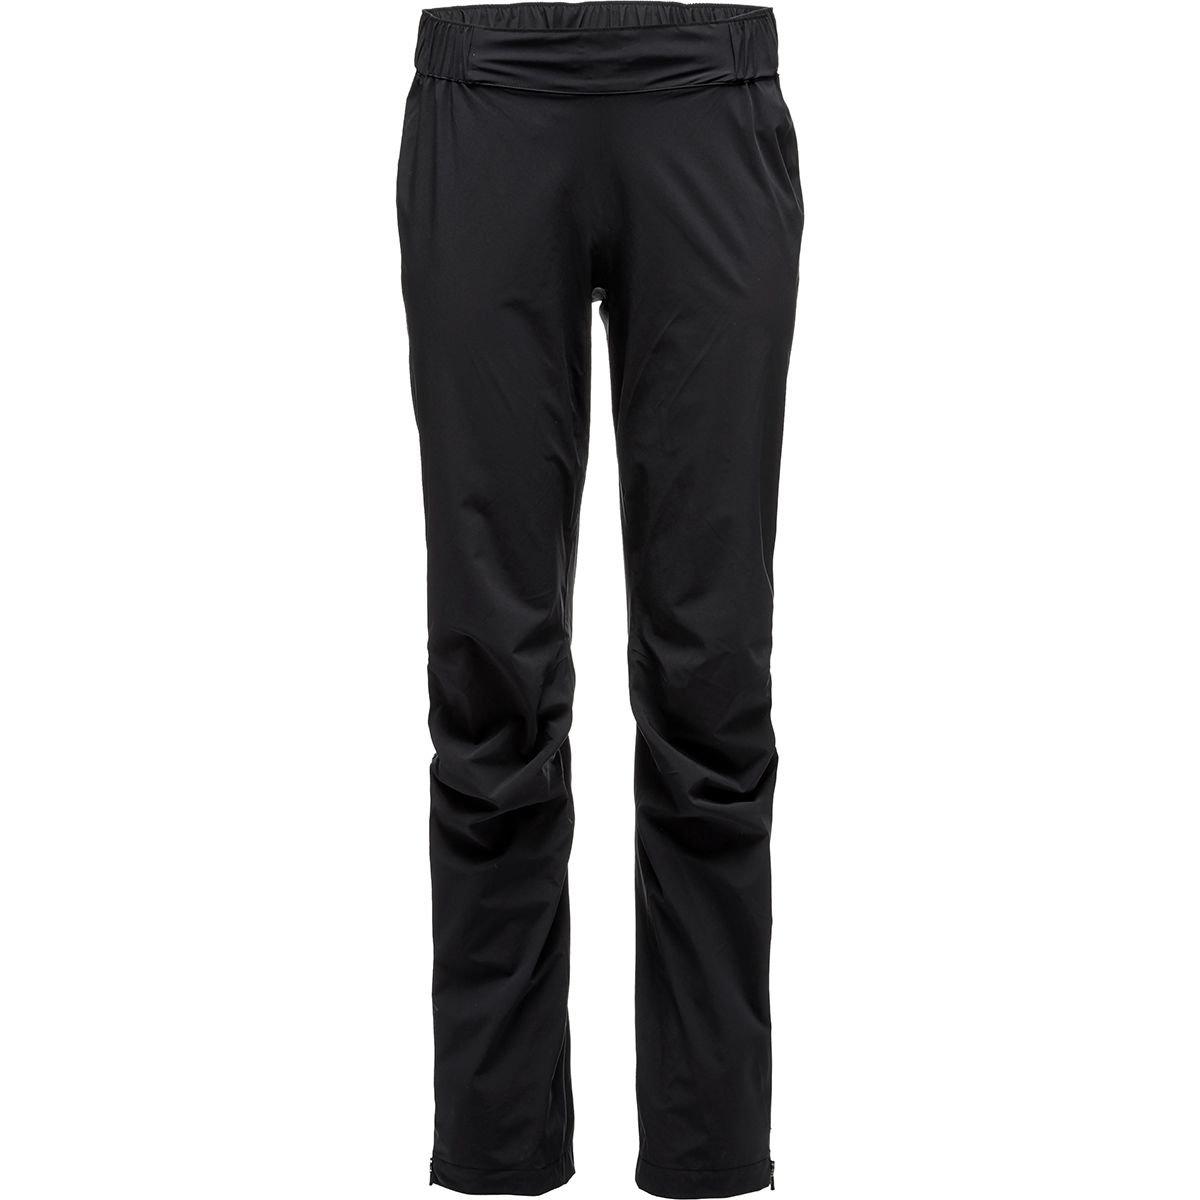 f1ab142b6fb Black Diamond Women s Stormline Stretch Rain Pants at Amazon Women s  Clothing store